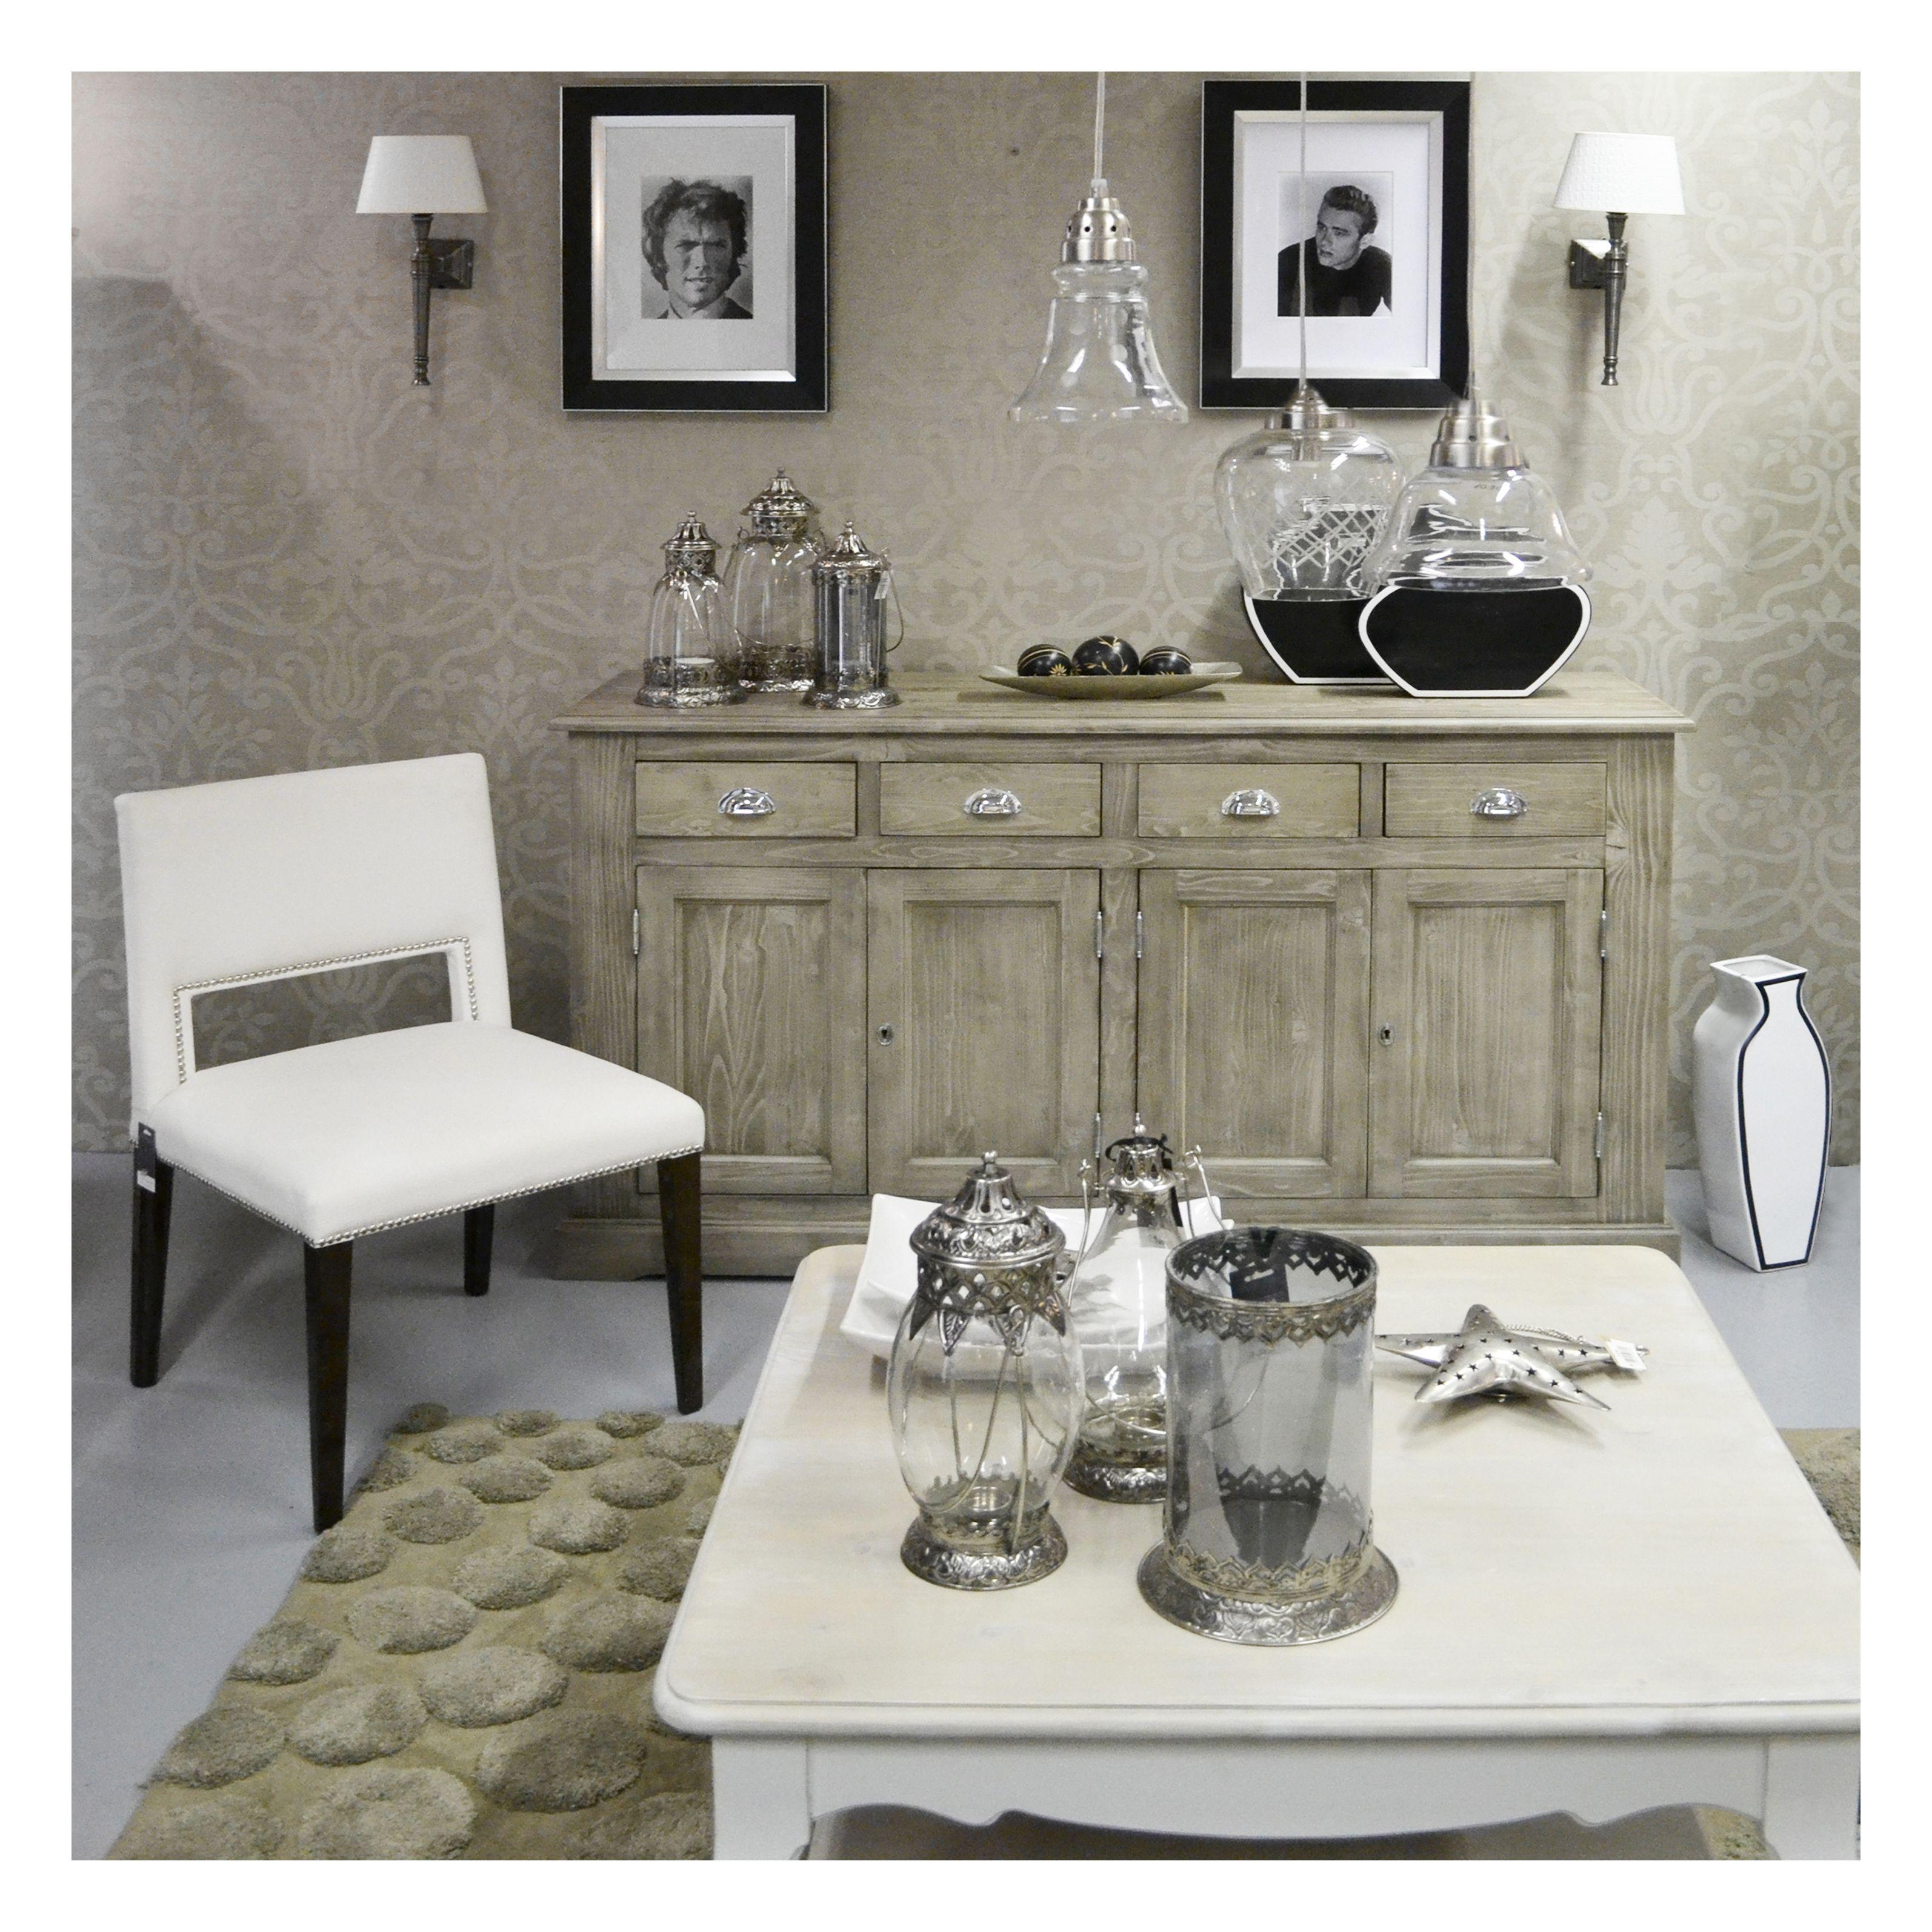 Rustic Living Roomdesign Ideas: Urban Rustic St Lus Sz Rke Kom D / Urban Rustic Style